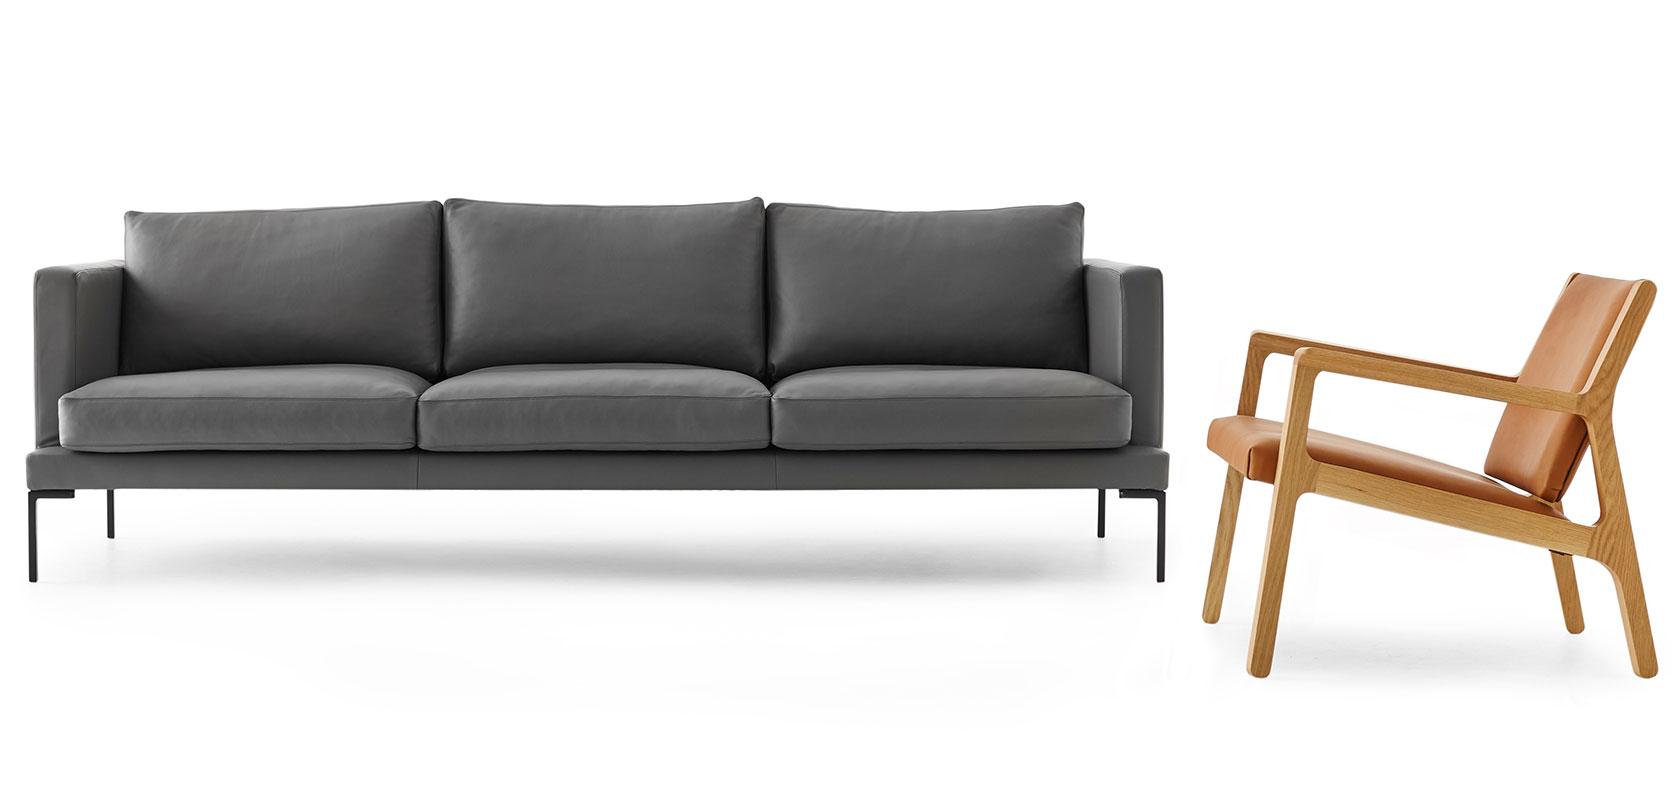 Hg Furniture Solutions Modern Designer Furniture Store Alexandria Sydney